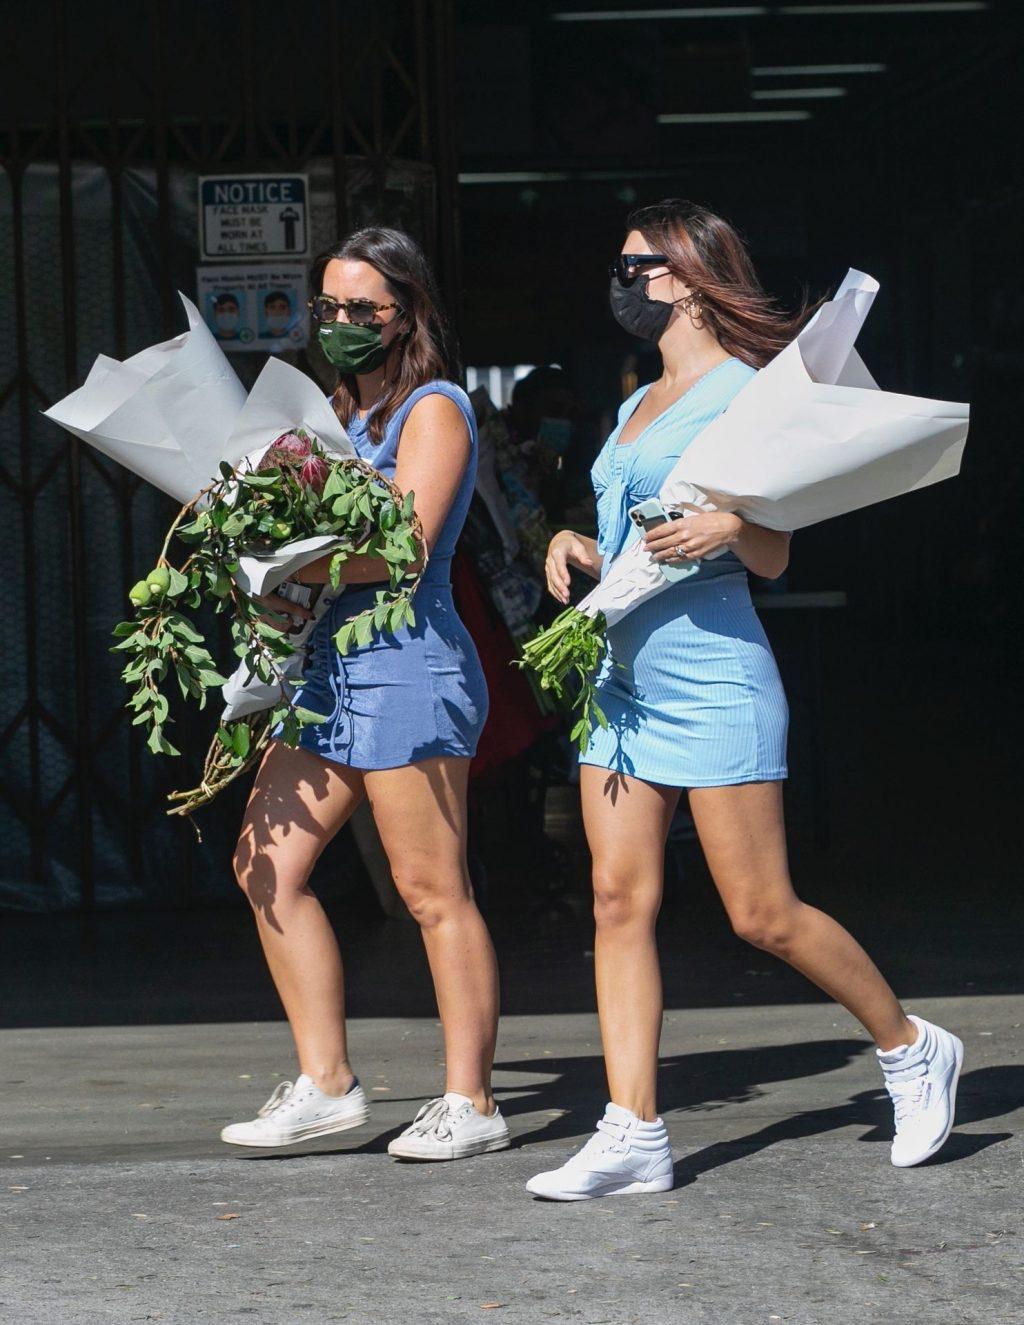 Emily Ratajkowski is Seen Shopping at the Flower Market in LA (49 Photos)